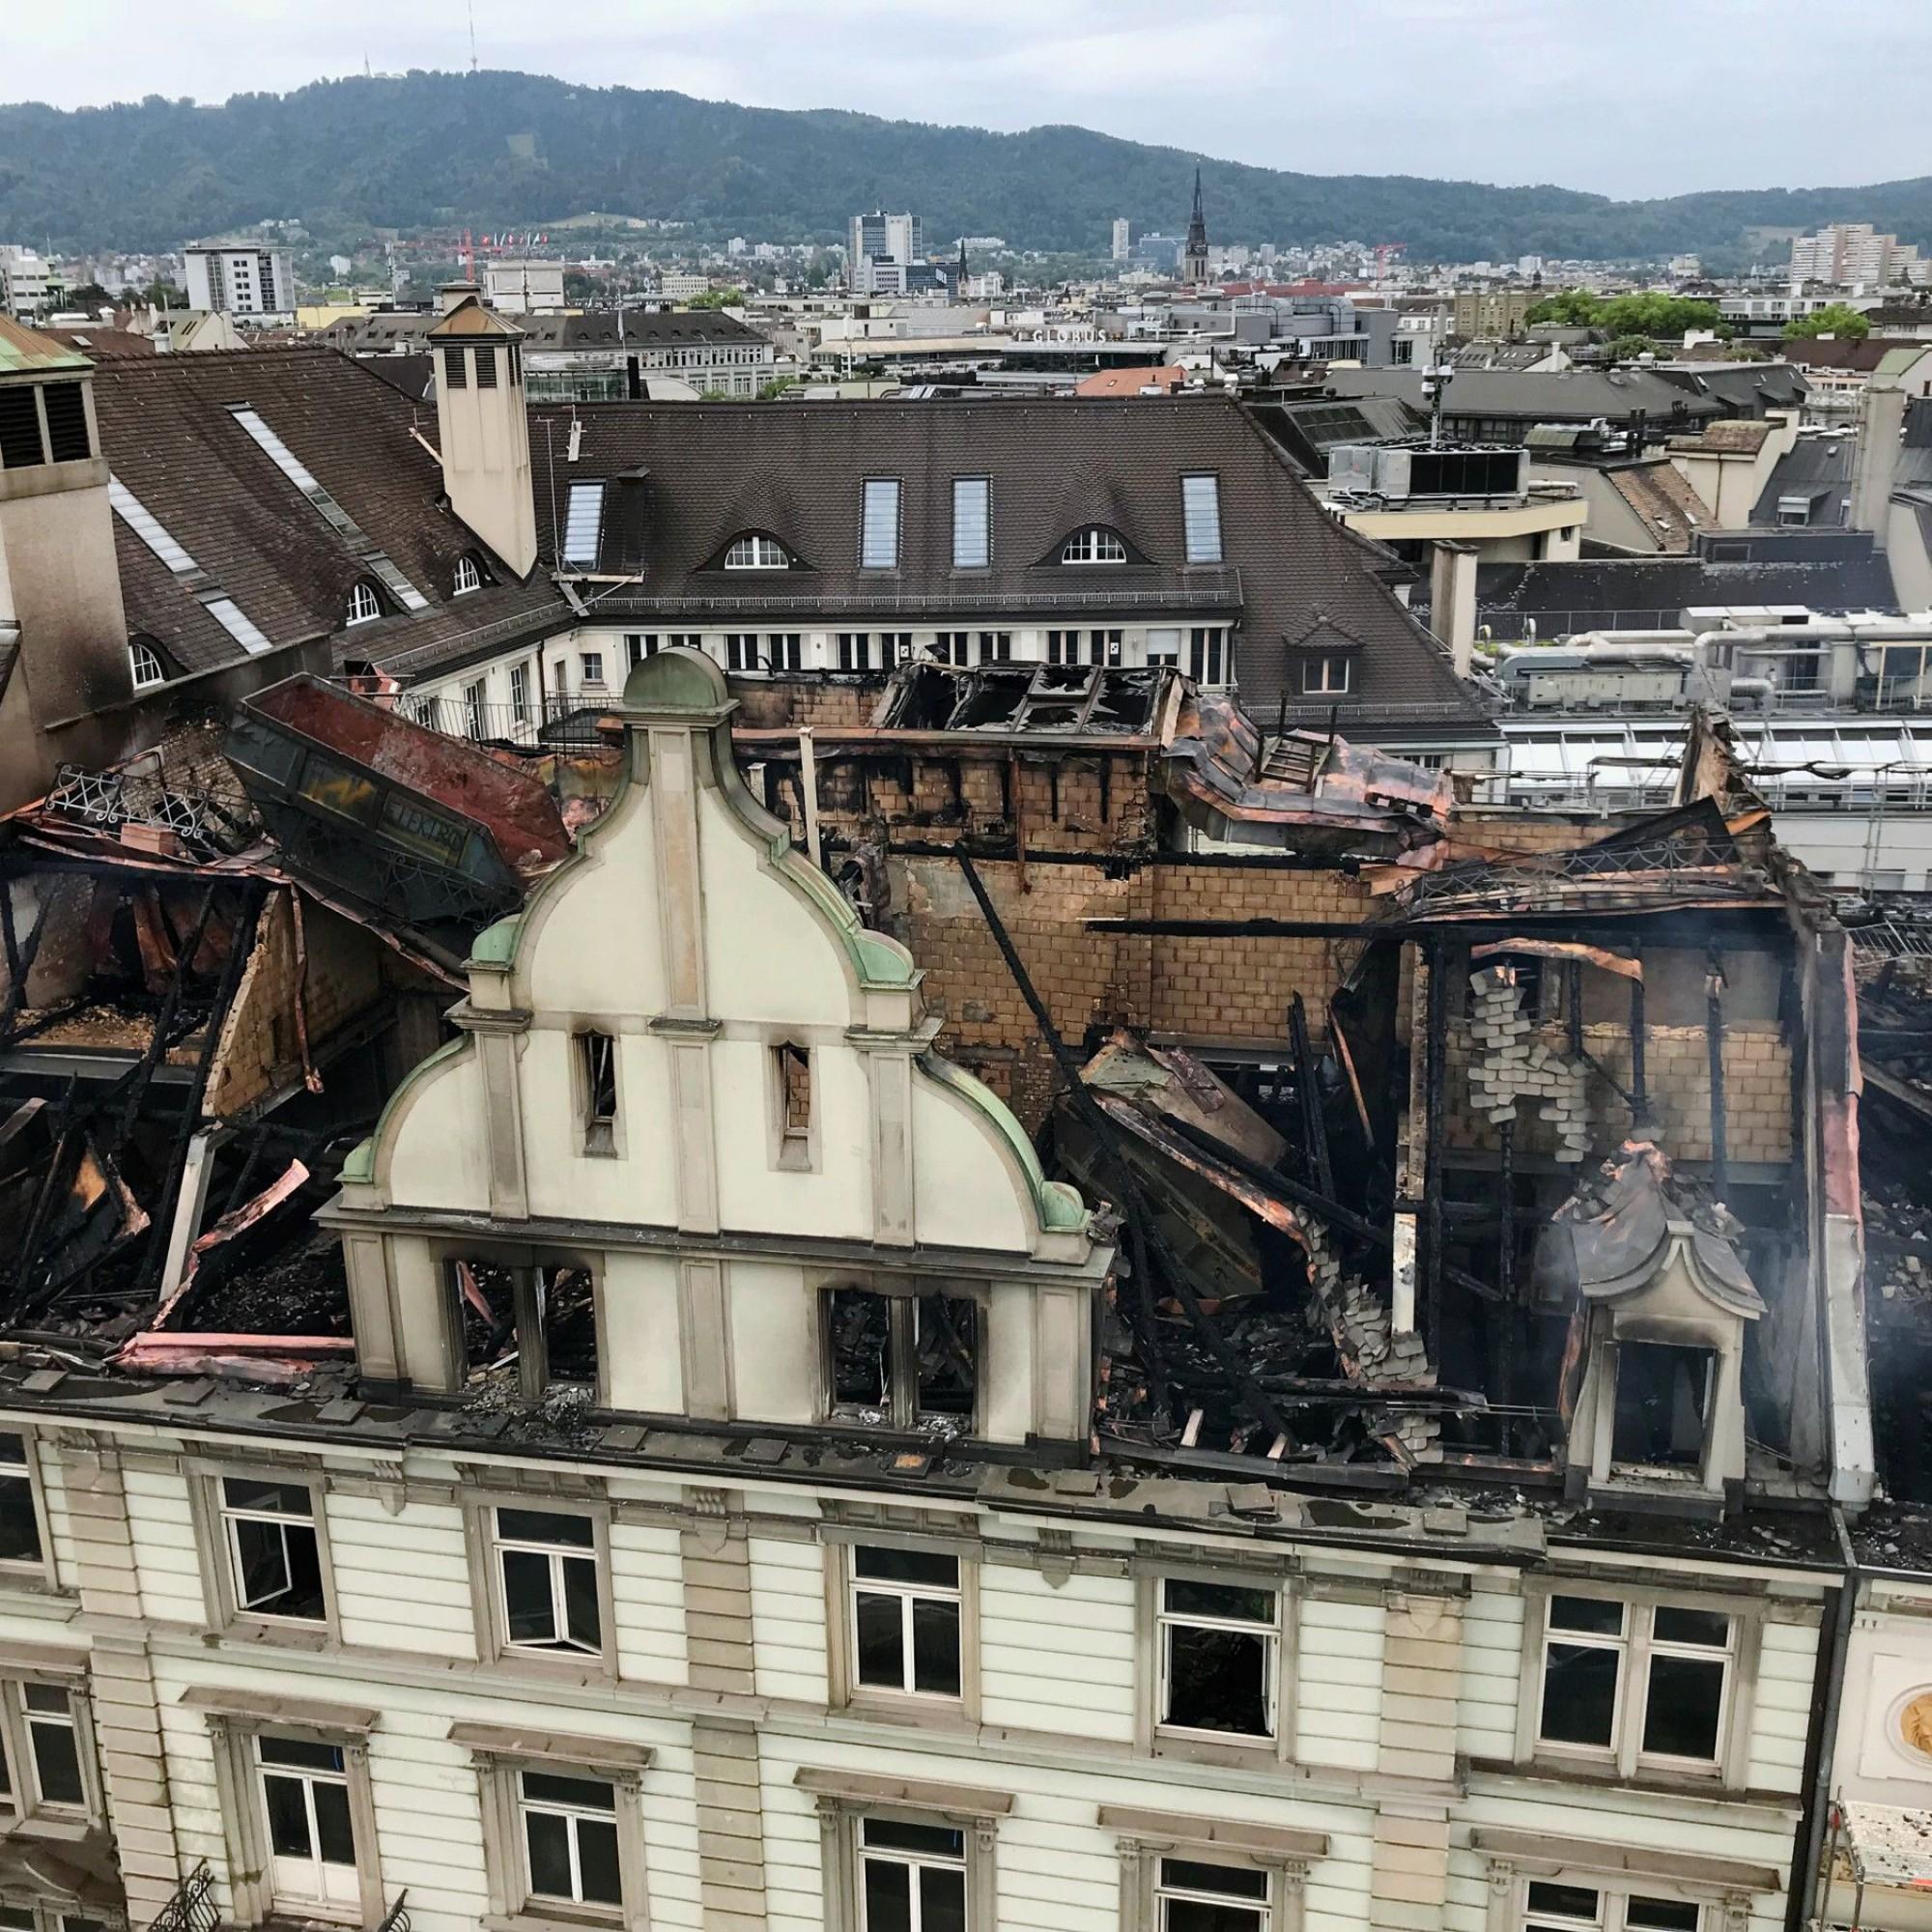 Sachschaden nach Grossbrand bei HB Zürich